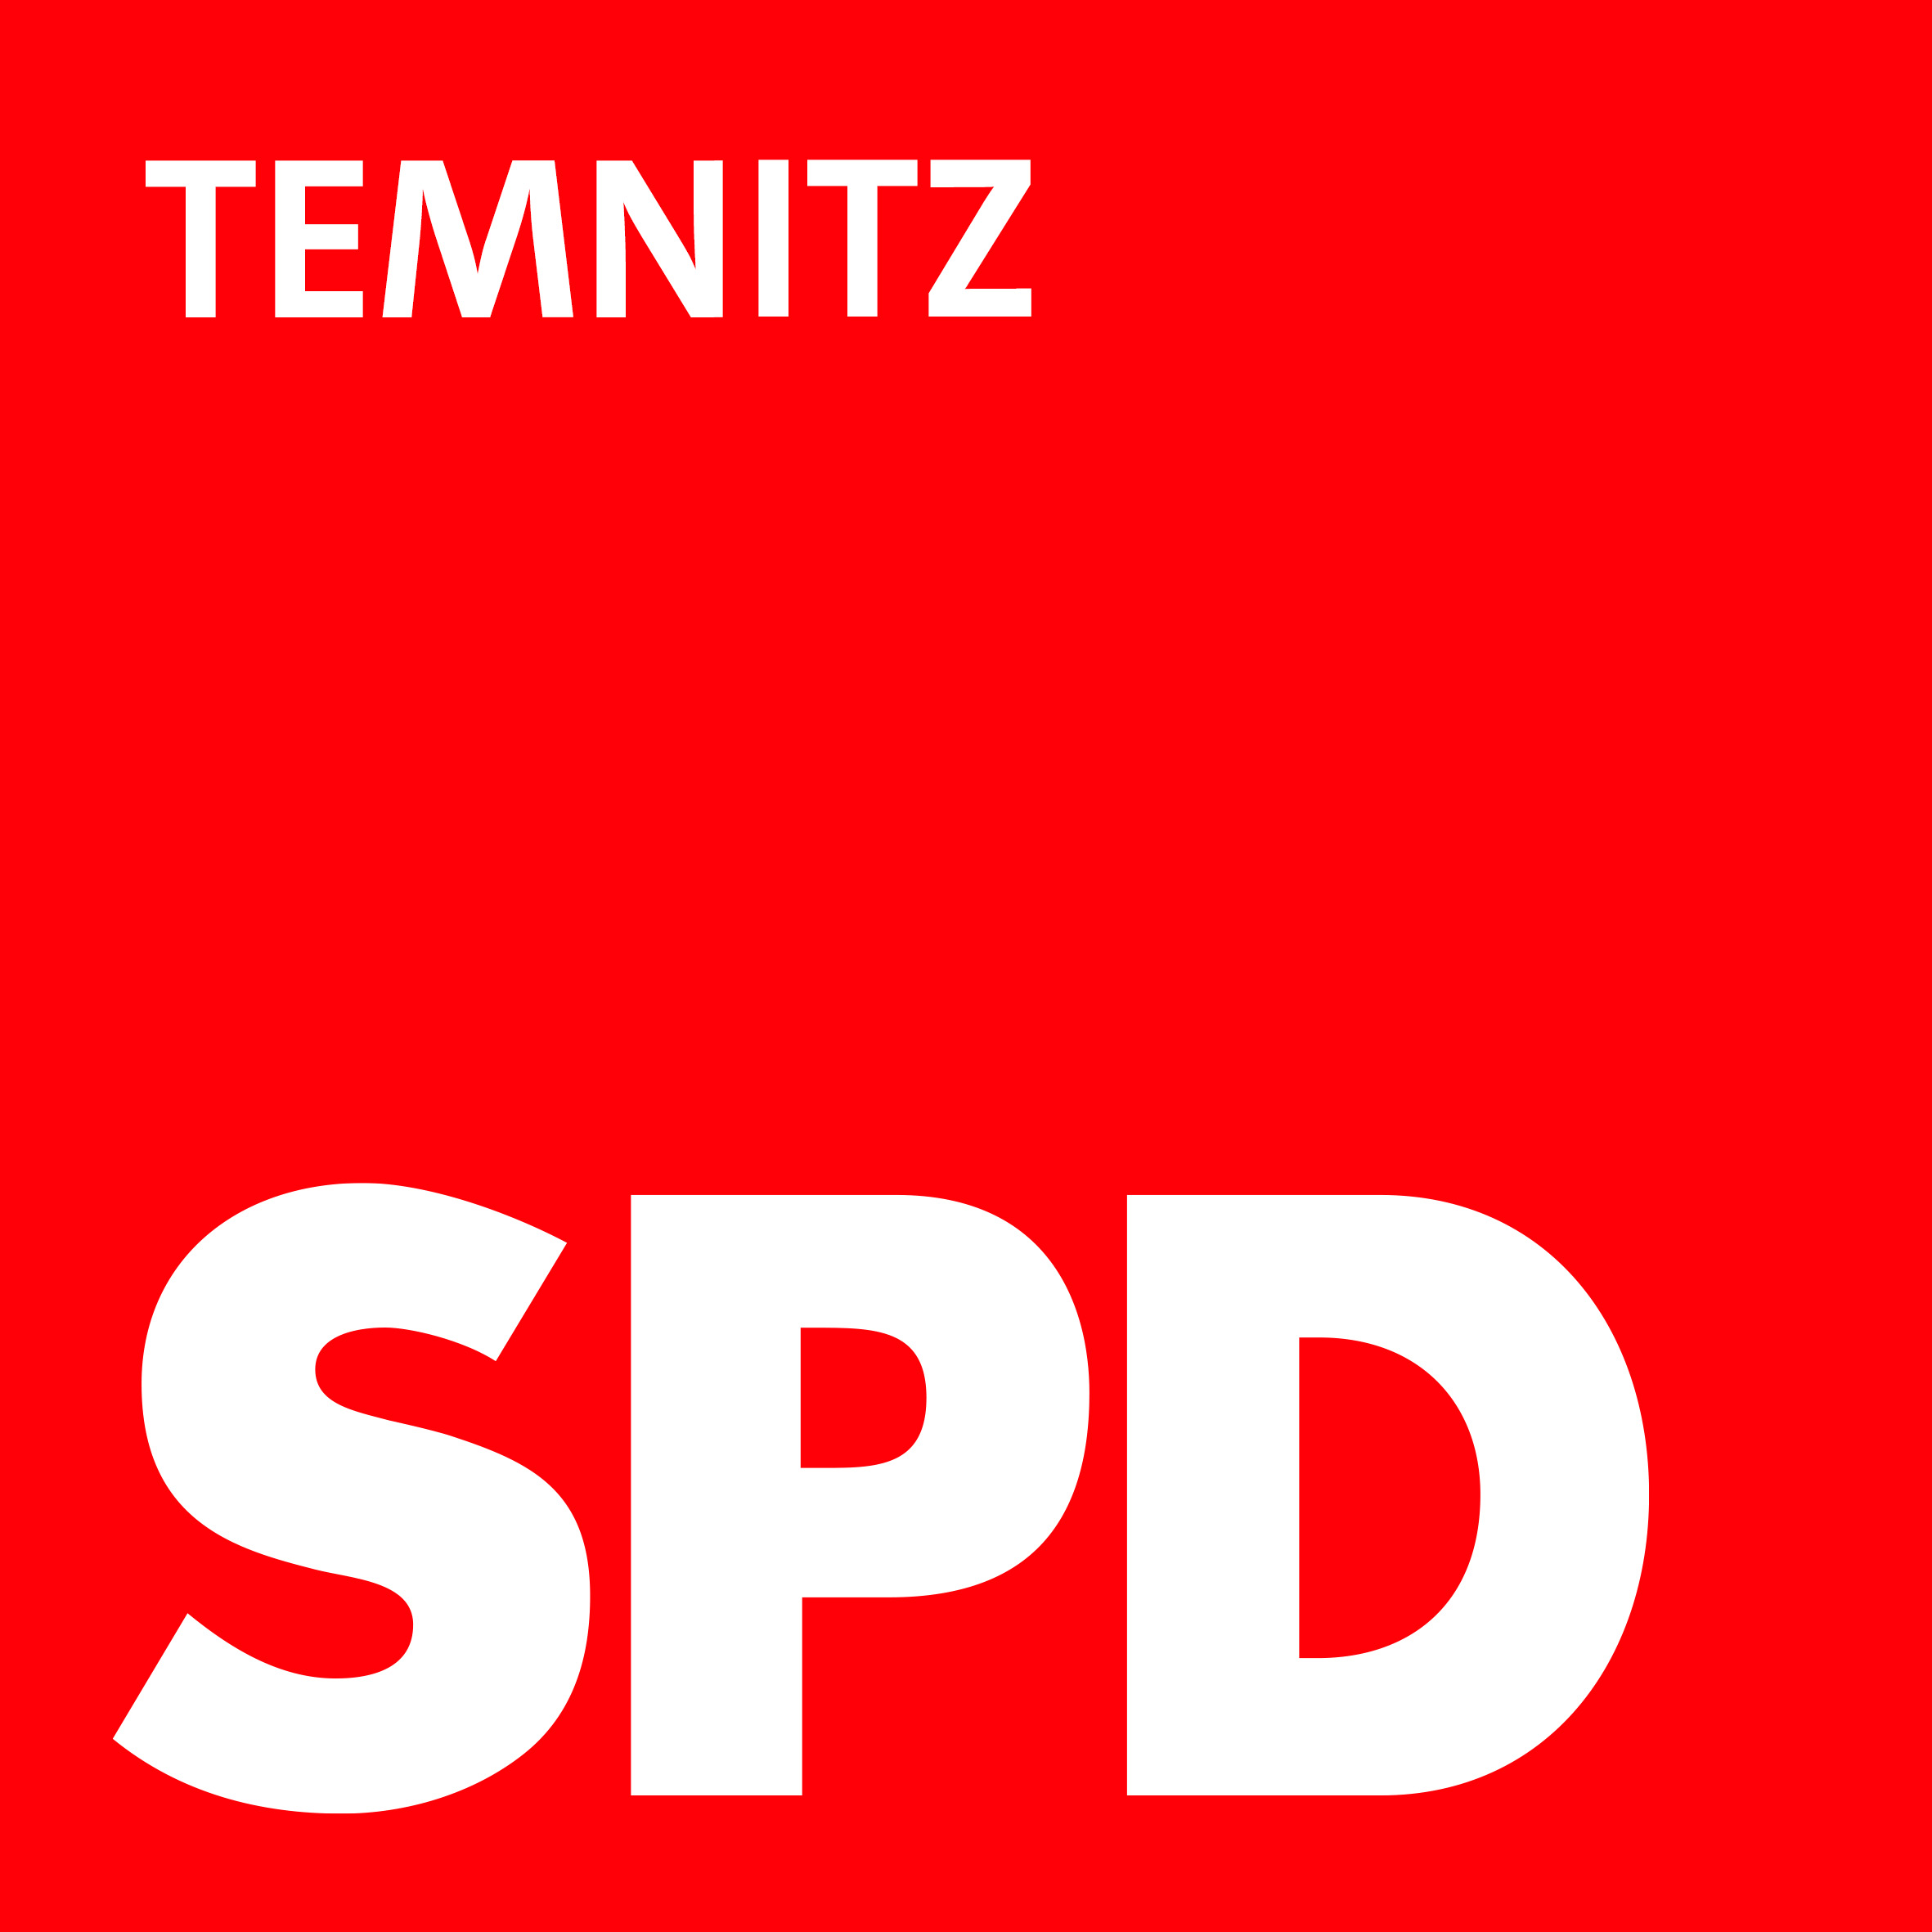 SPD Temnitz